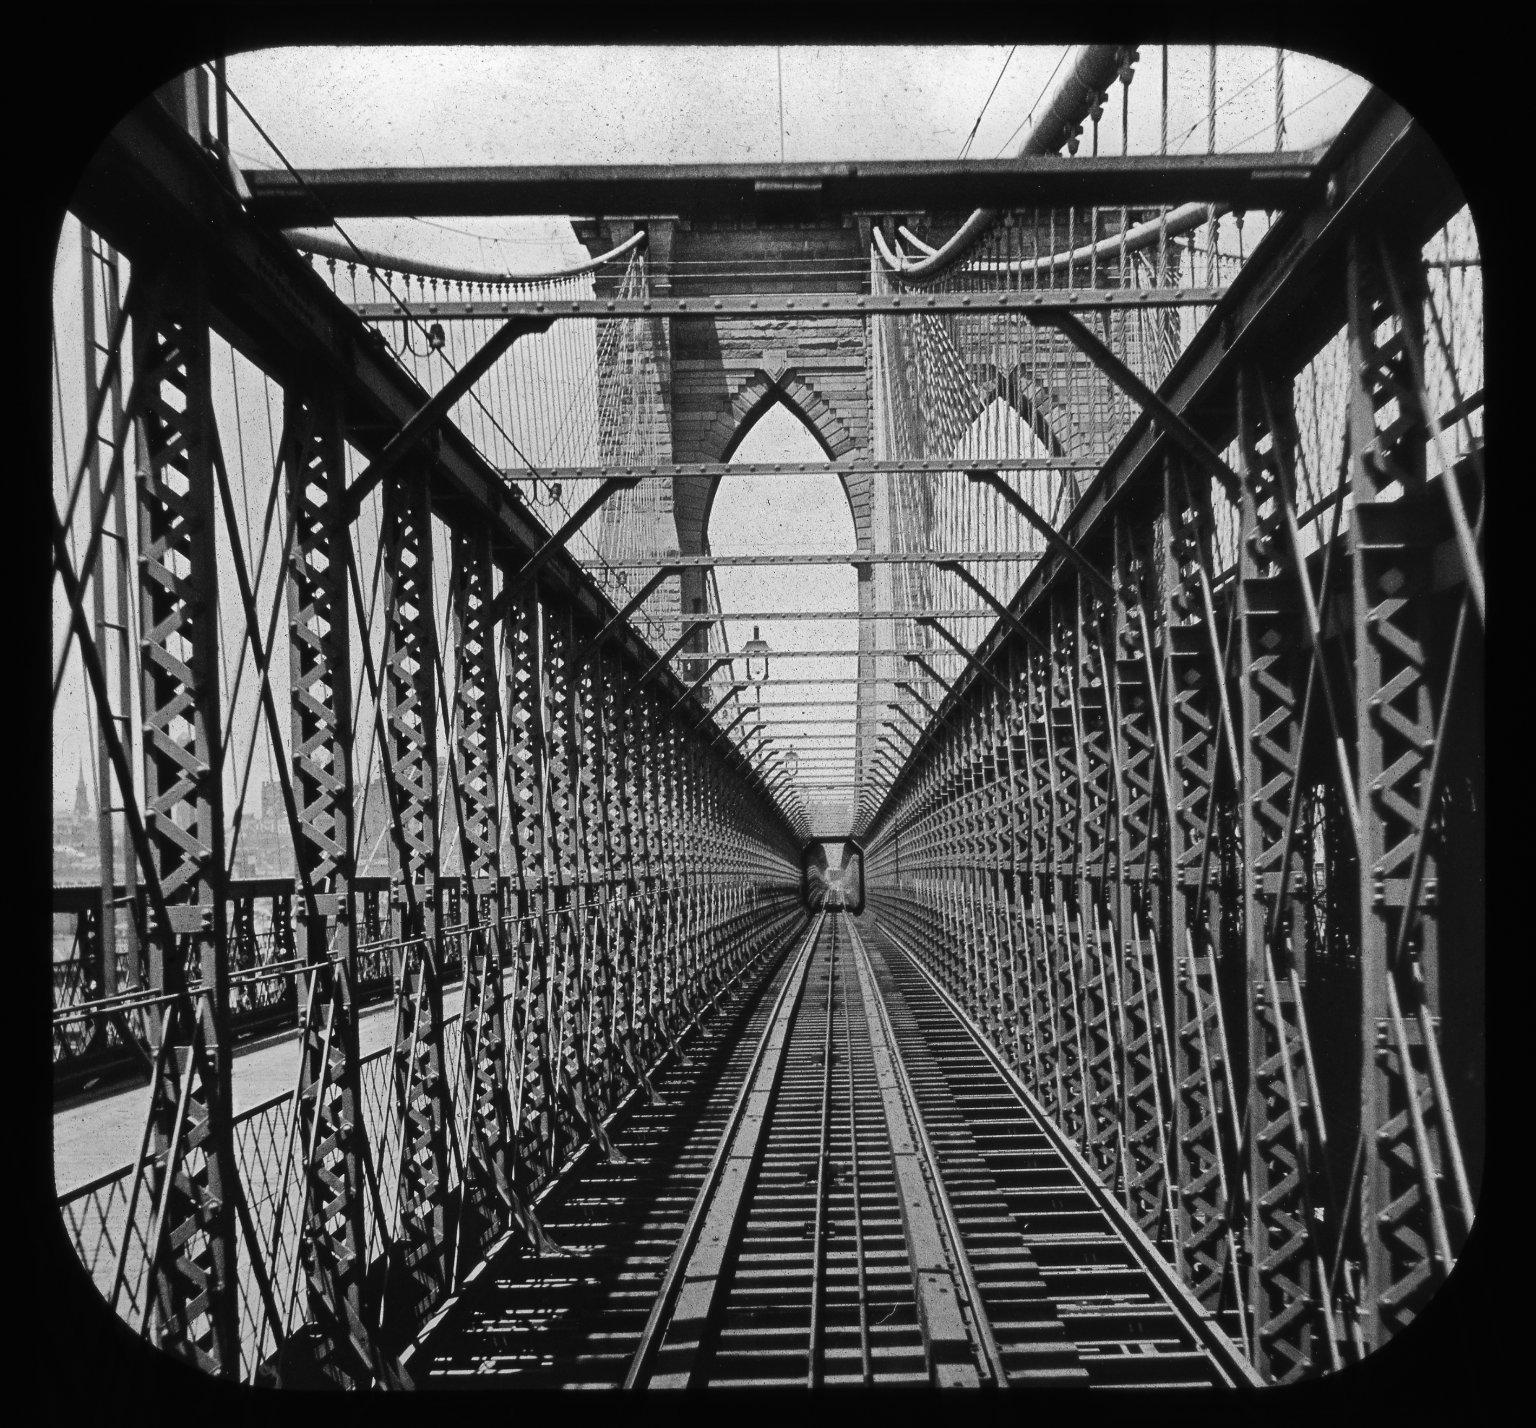 Brooklyn Bridge from car platform. Creator- S. W. Lewis Collection- Lantern Slide Collection Views- U.S., Brooklyn Brooklyn Bridge 1896-1900